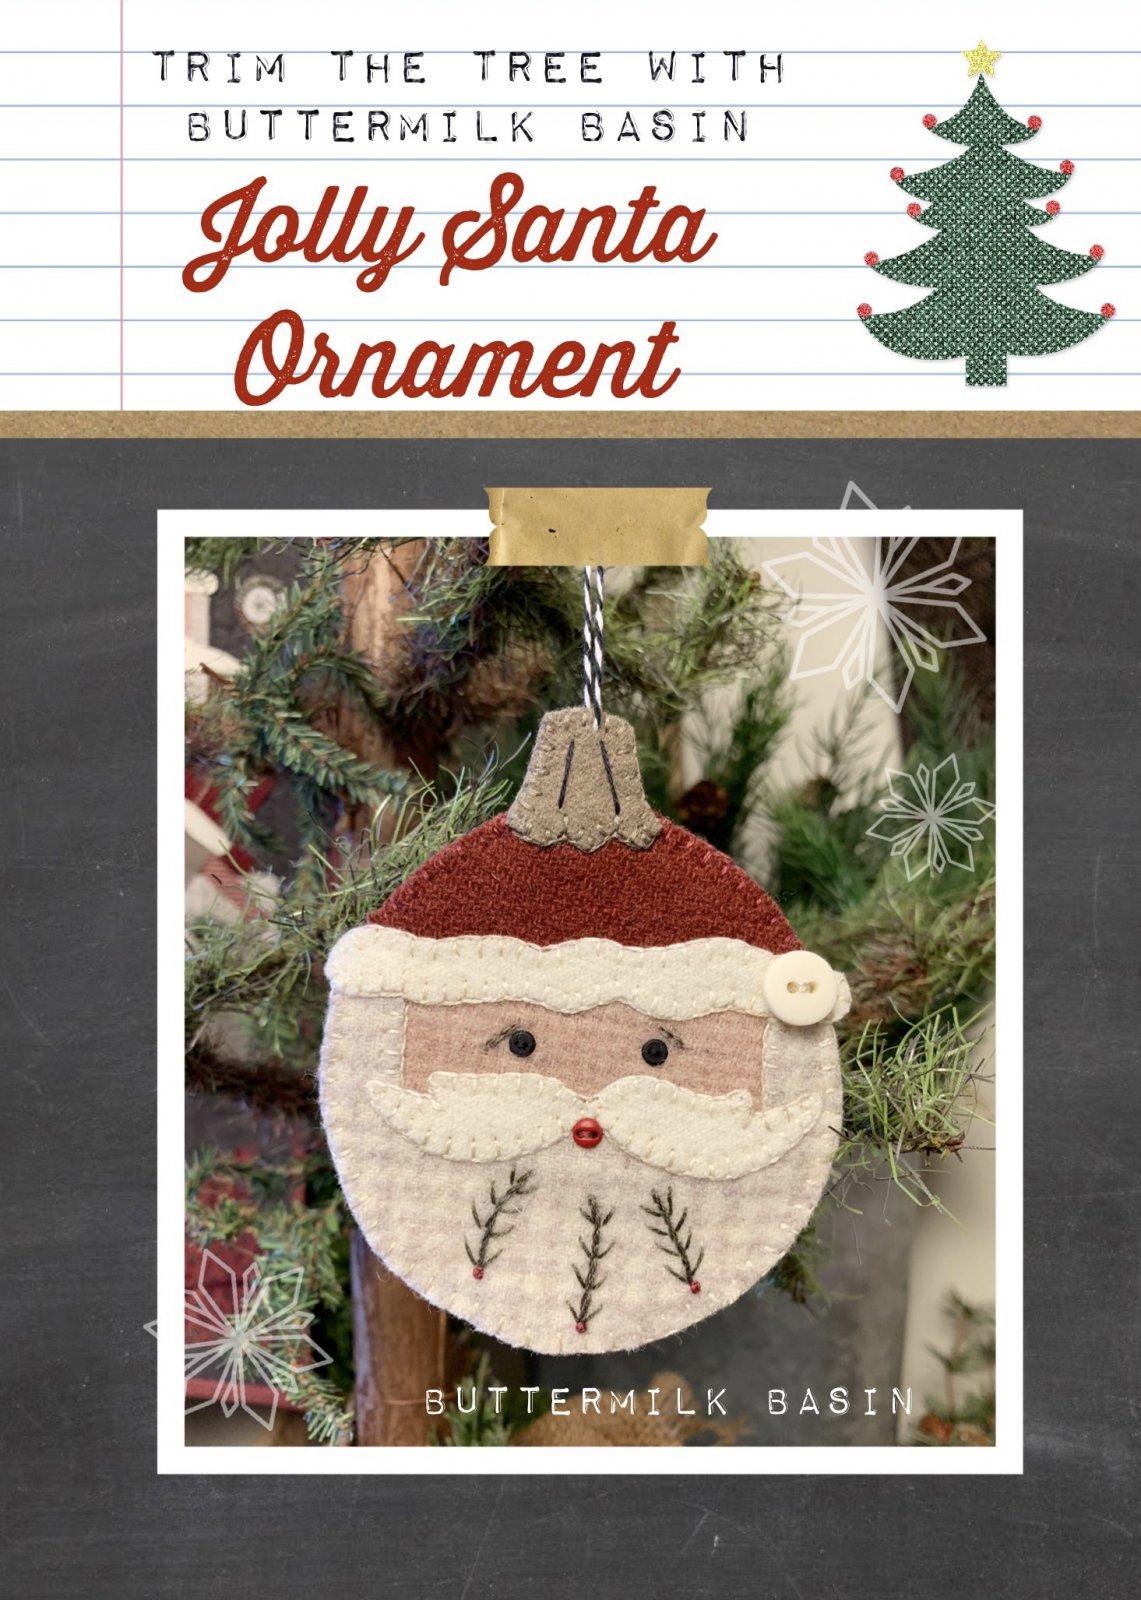 Jolly Santa Ornament Pattern and Kit